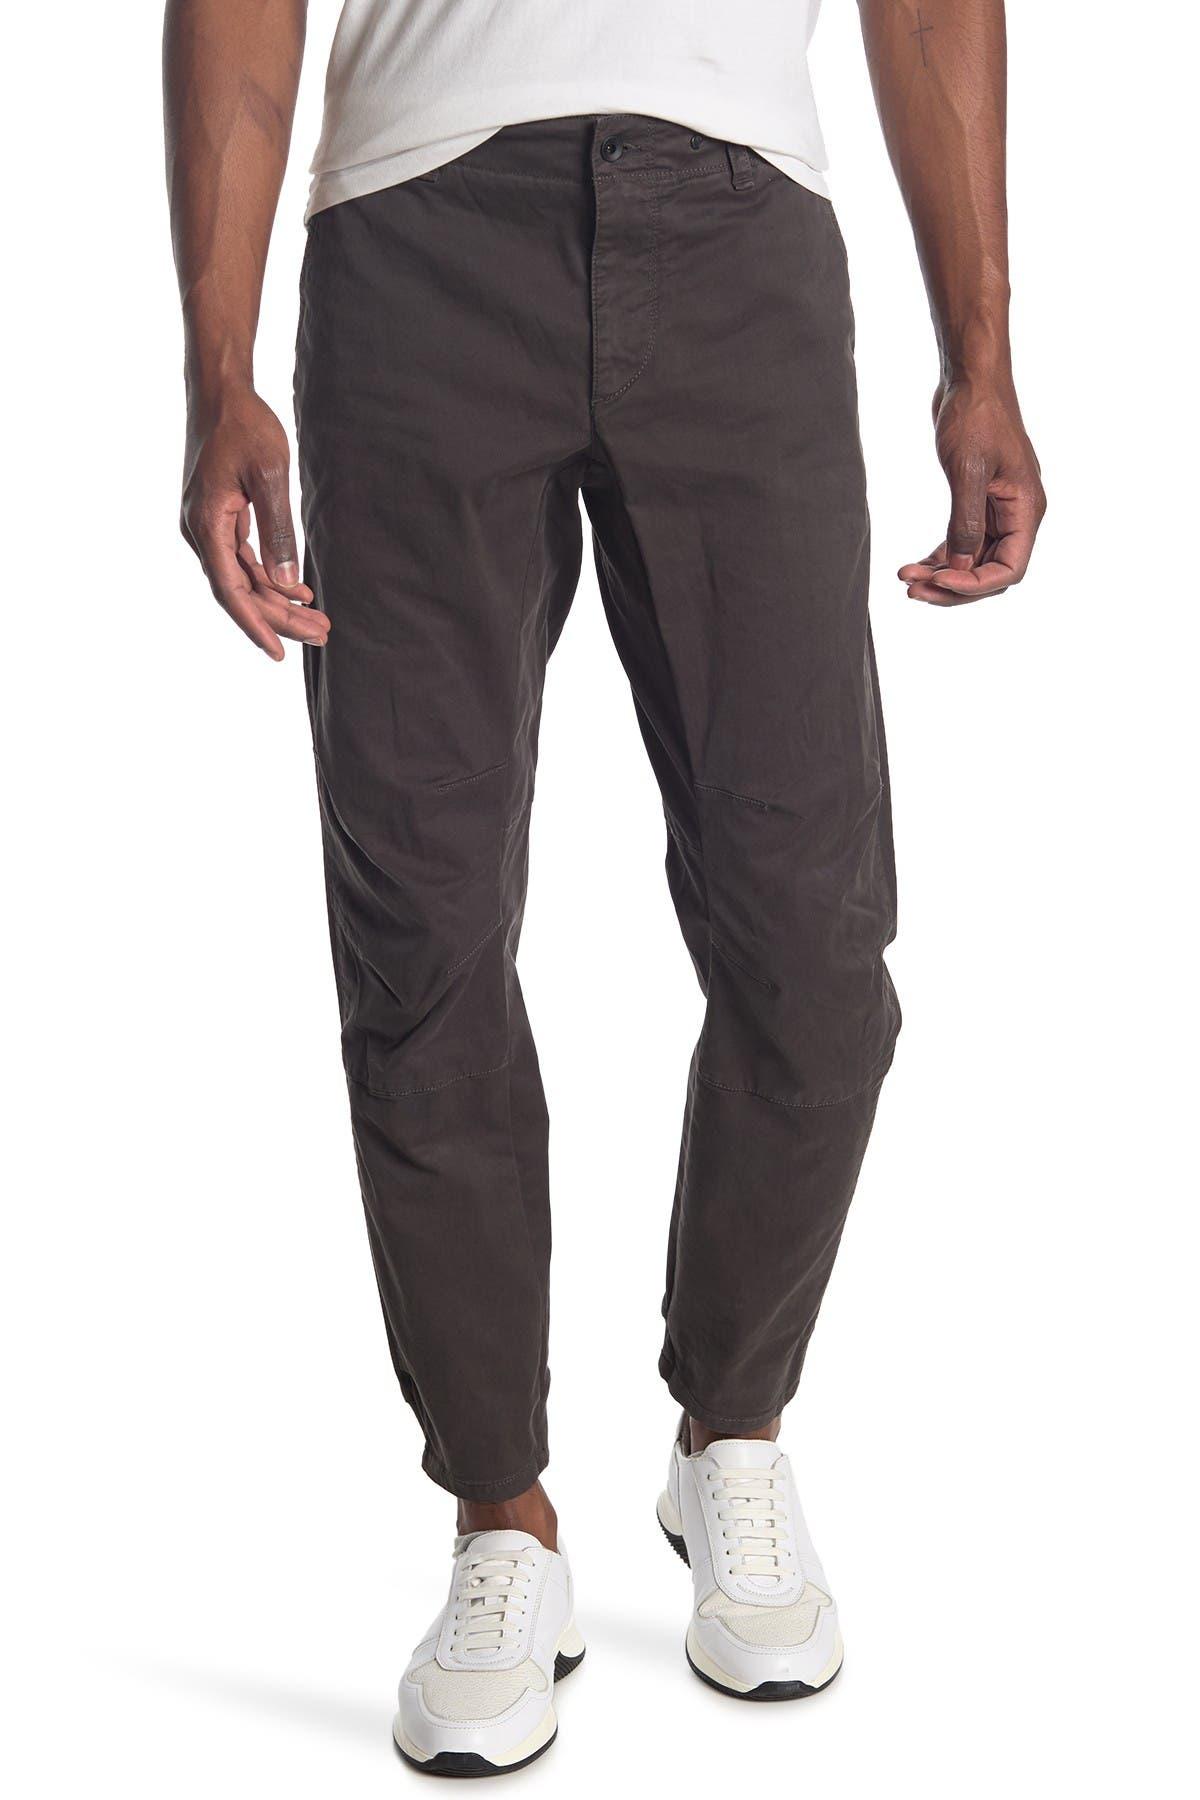 Image of Rag & Bone Articulated Chino Pants